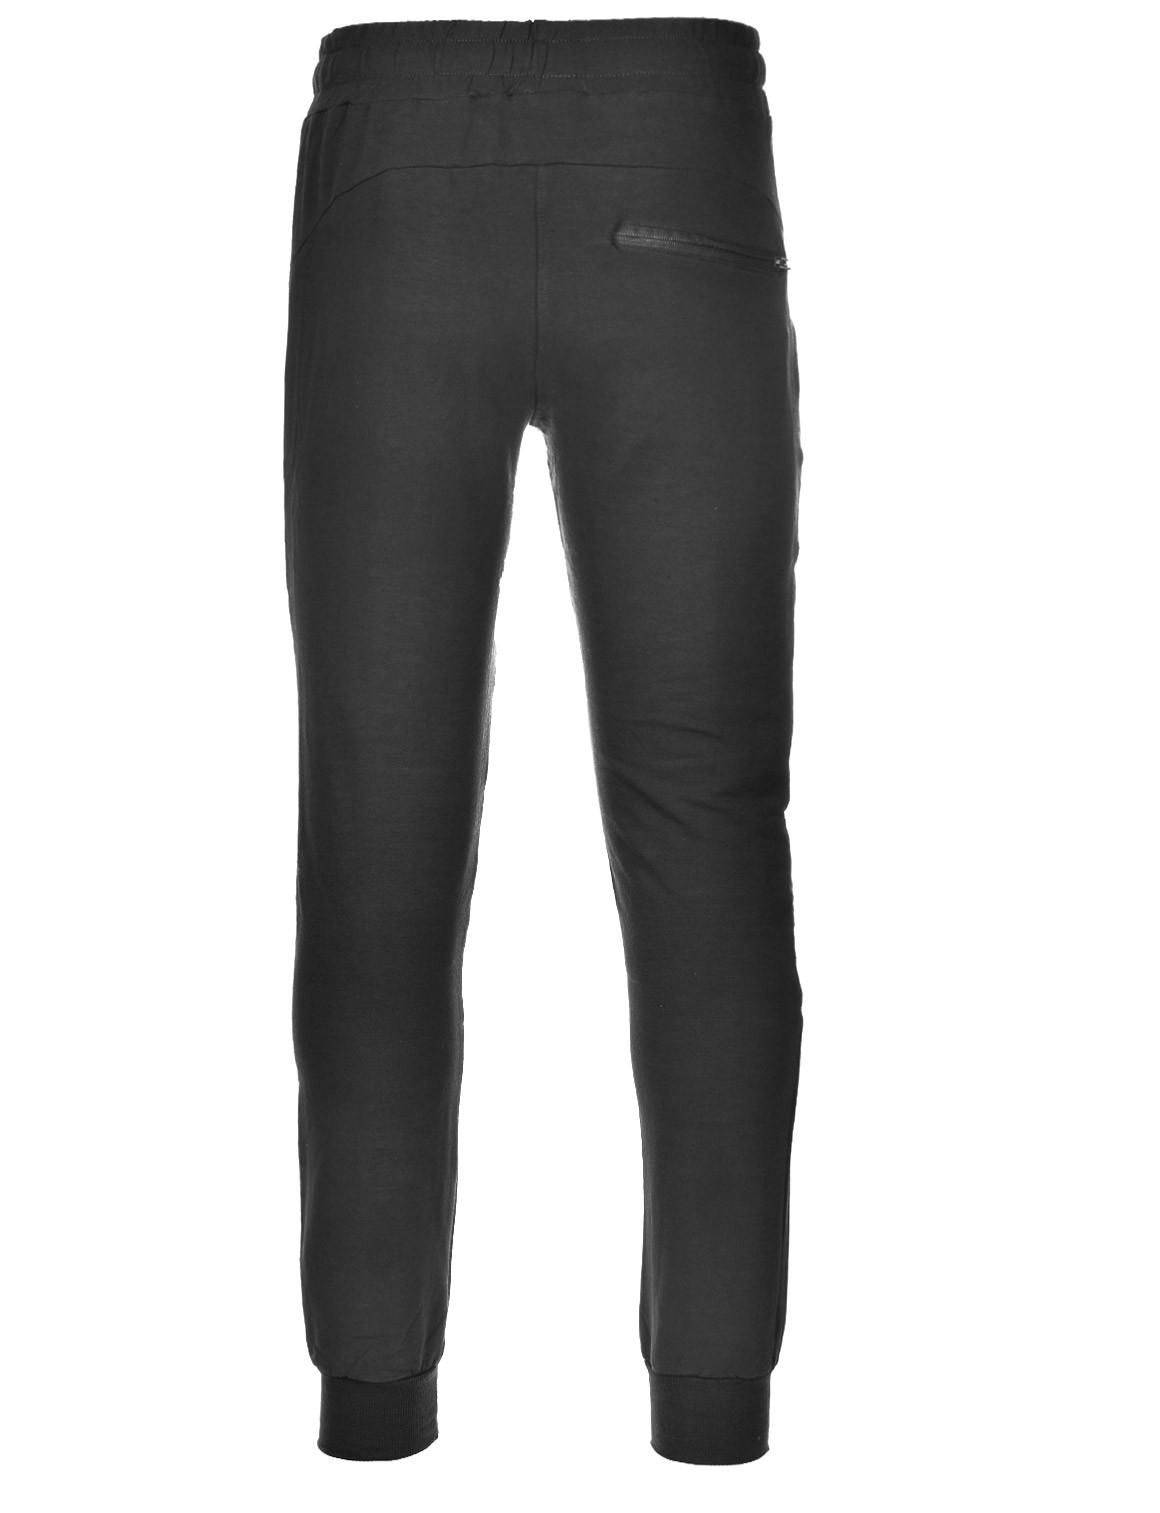 Sweatpants SHOGUN Black